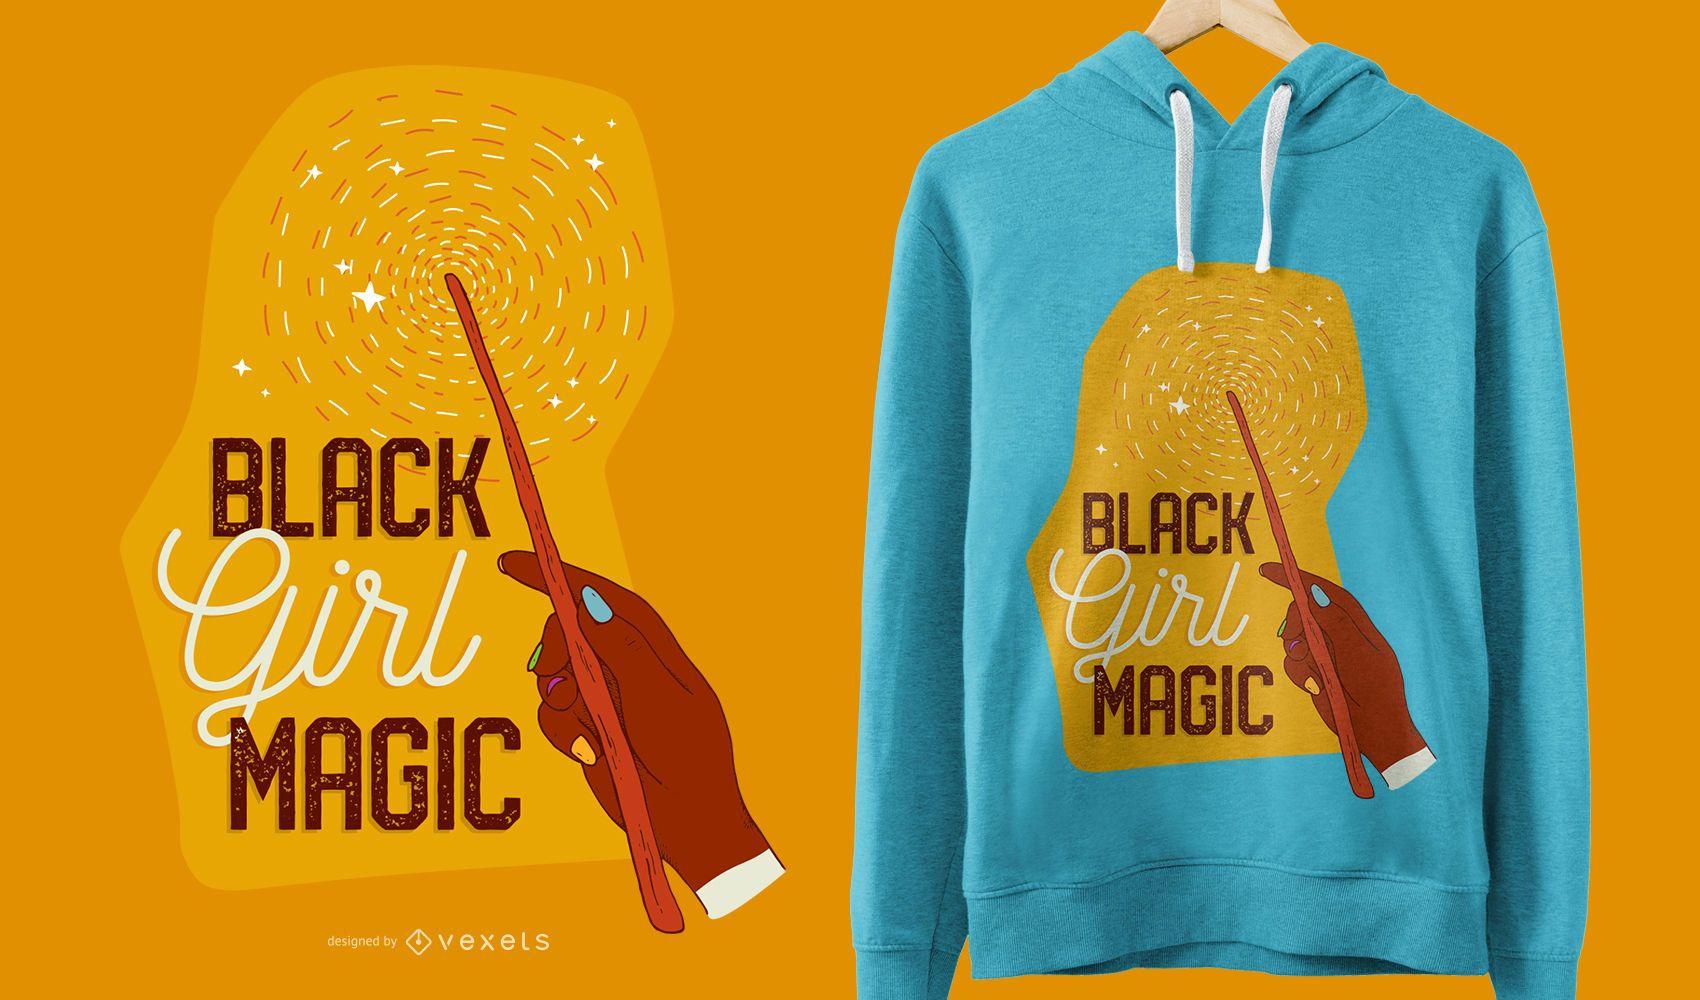 Black Girl Magic T-shirt Design